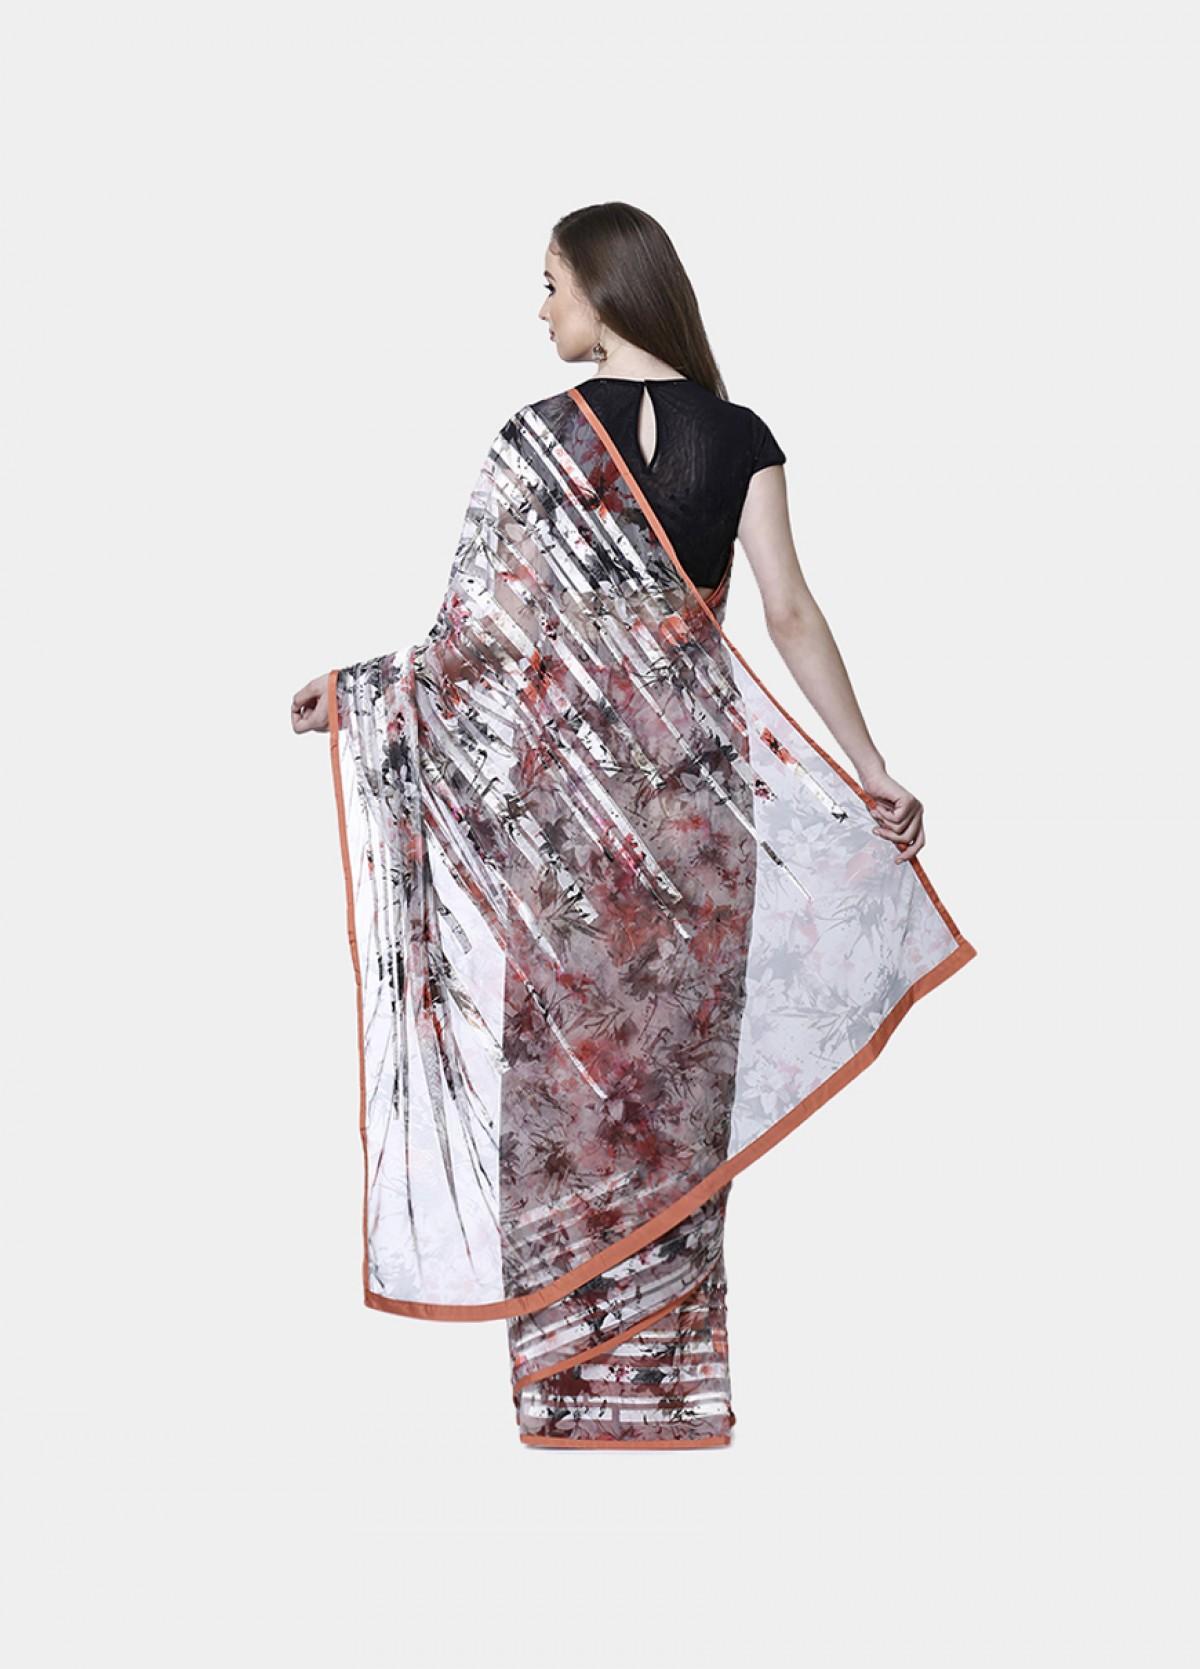 The Embroidered Satin Printed Sari